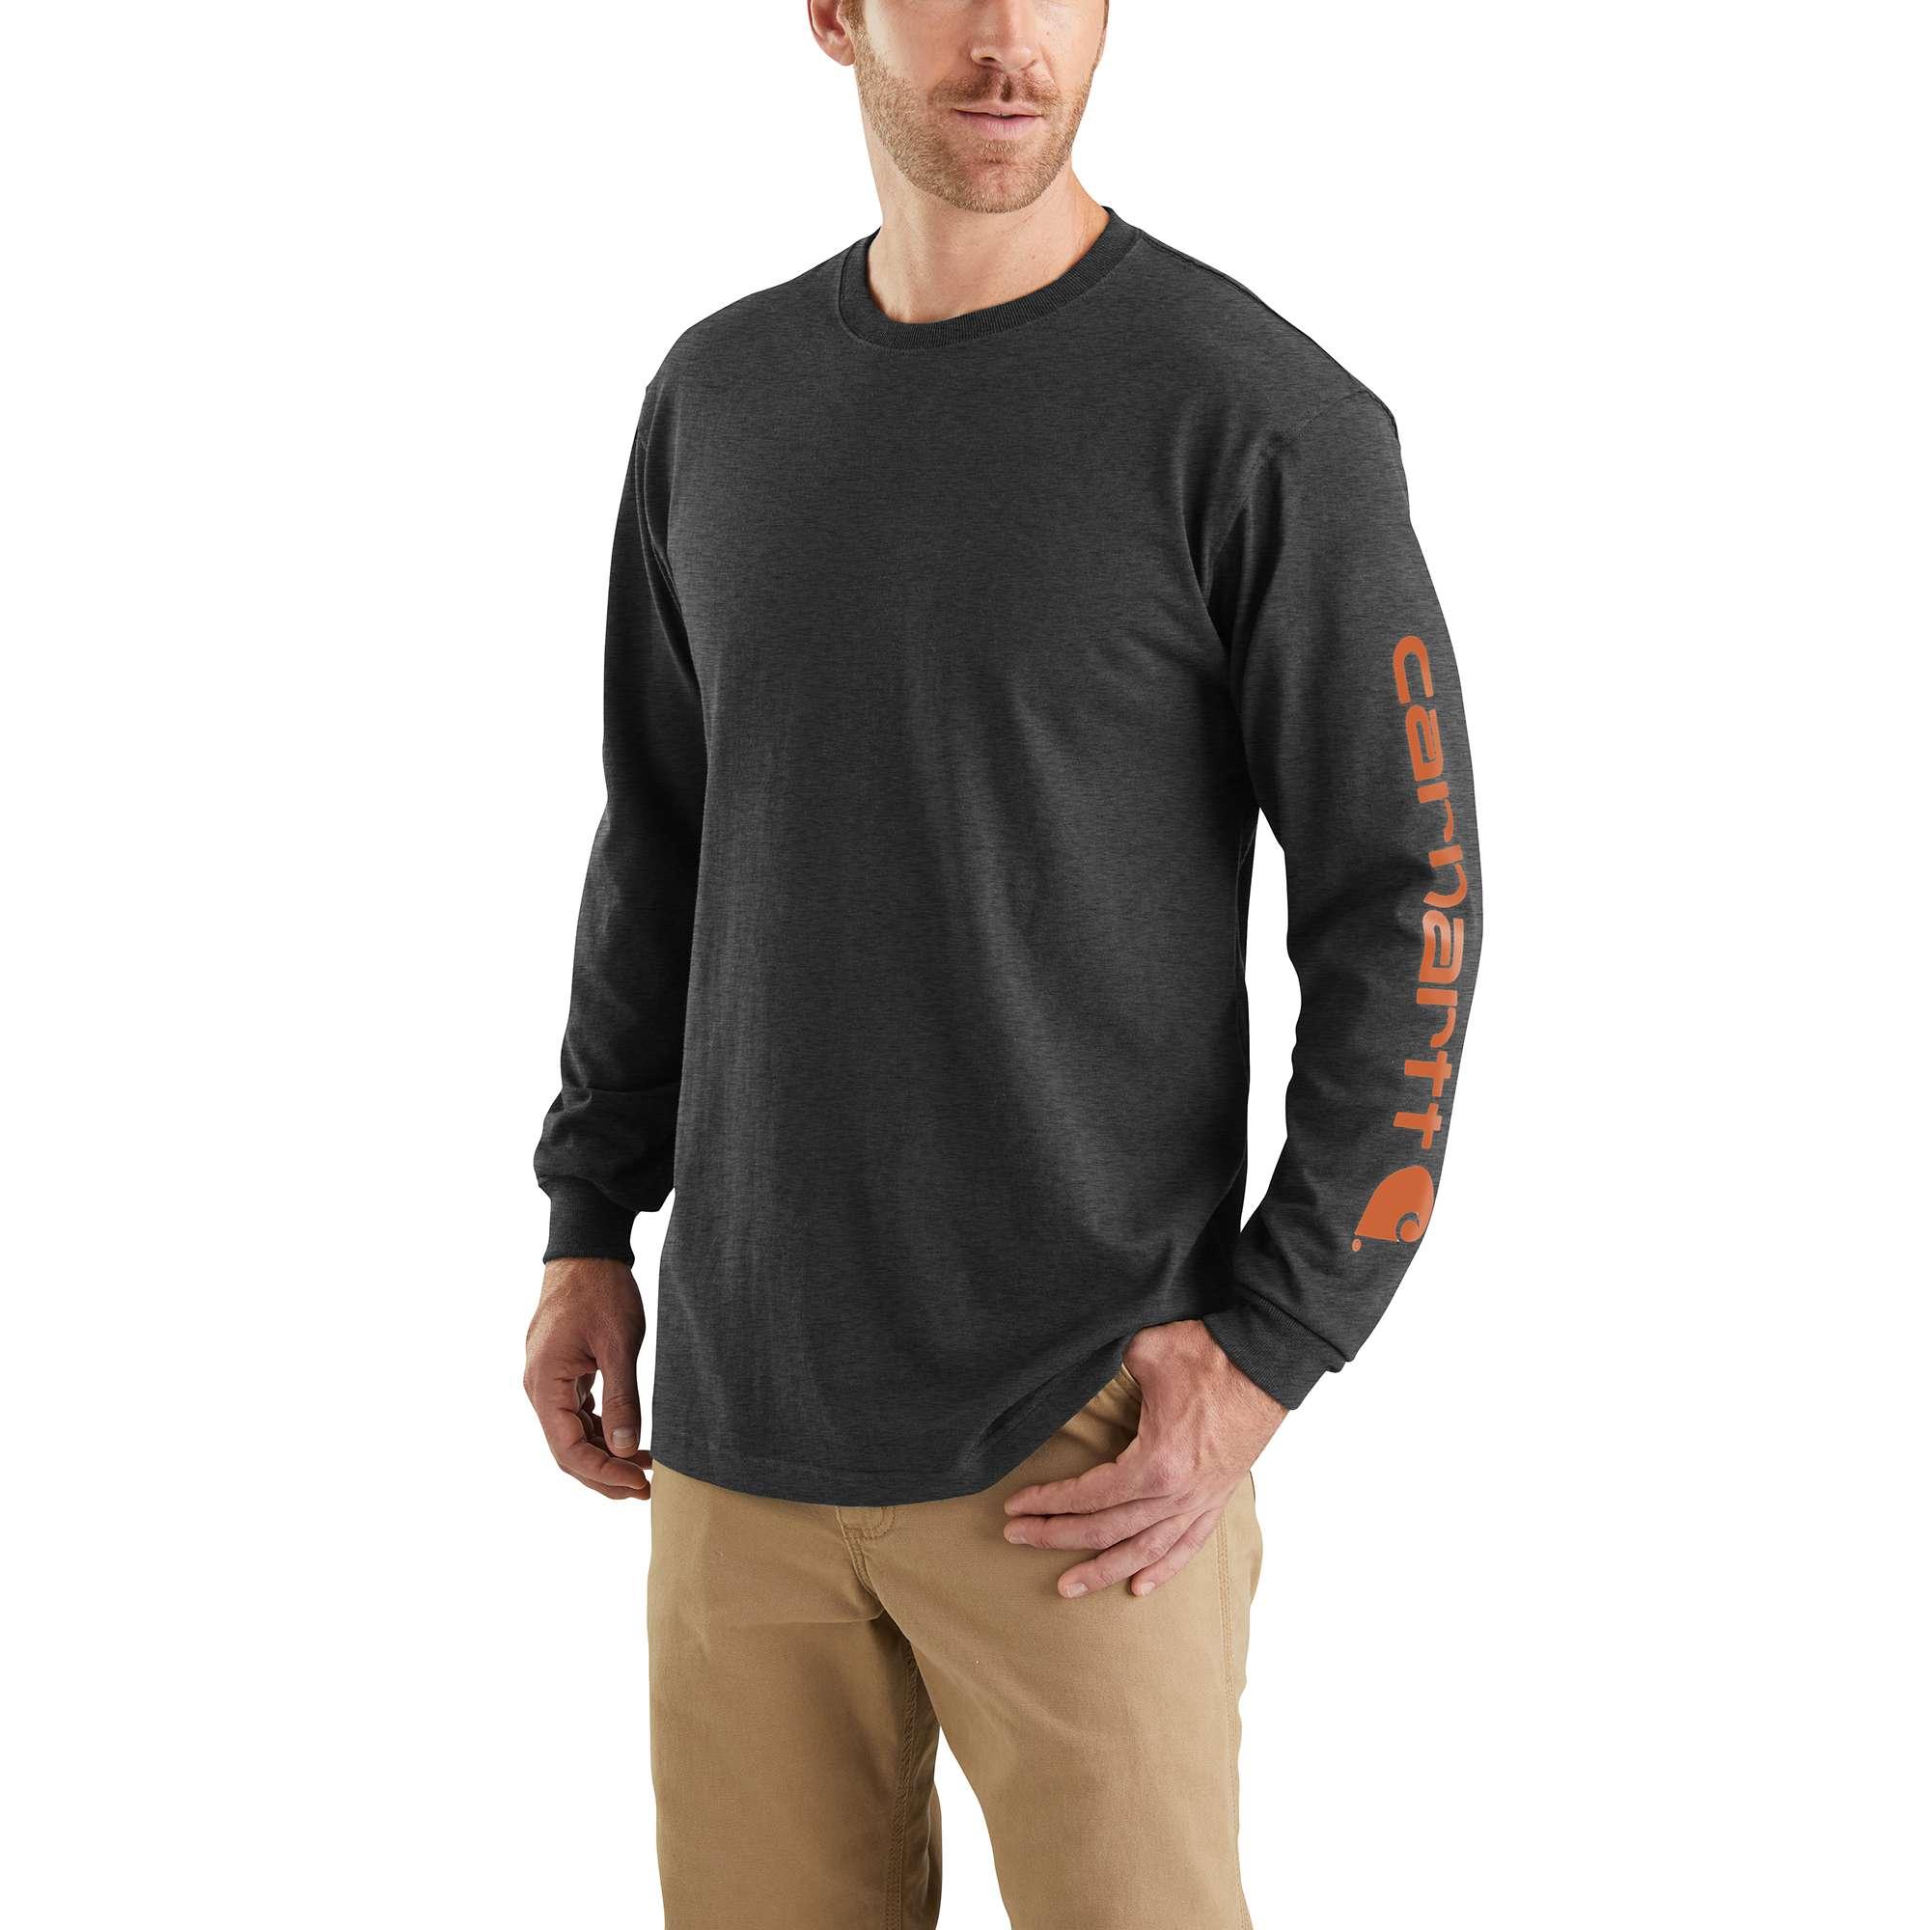 Men's Big and Tall Signature-Sleeve Logo Long-Sleeve T-Shirt, Gray, swatch